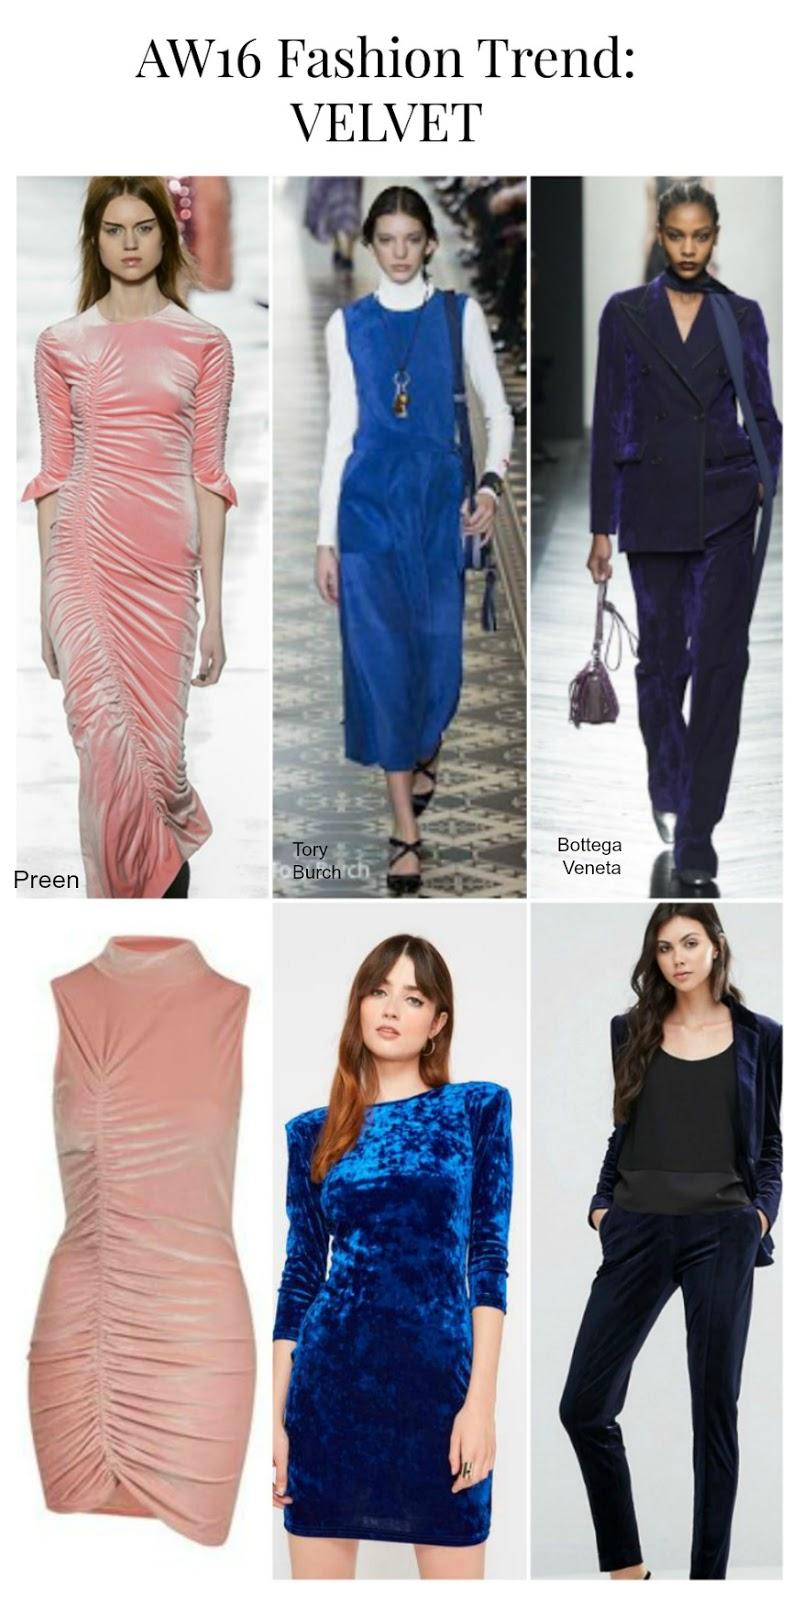 aw16 Fashion Trend Velvet